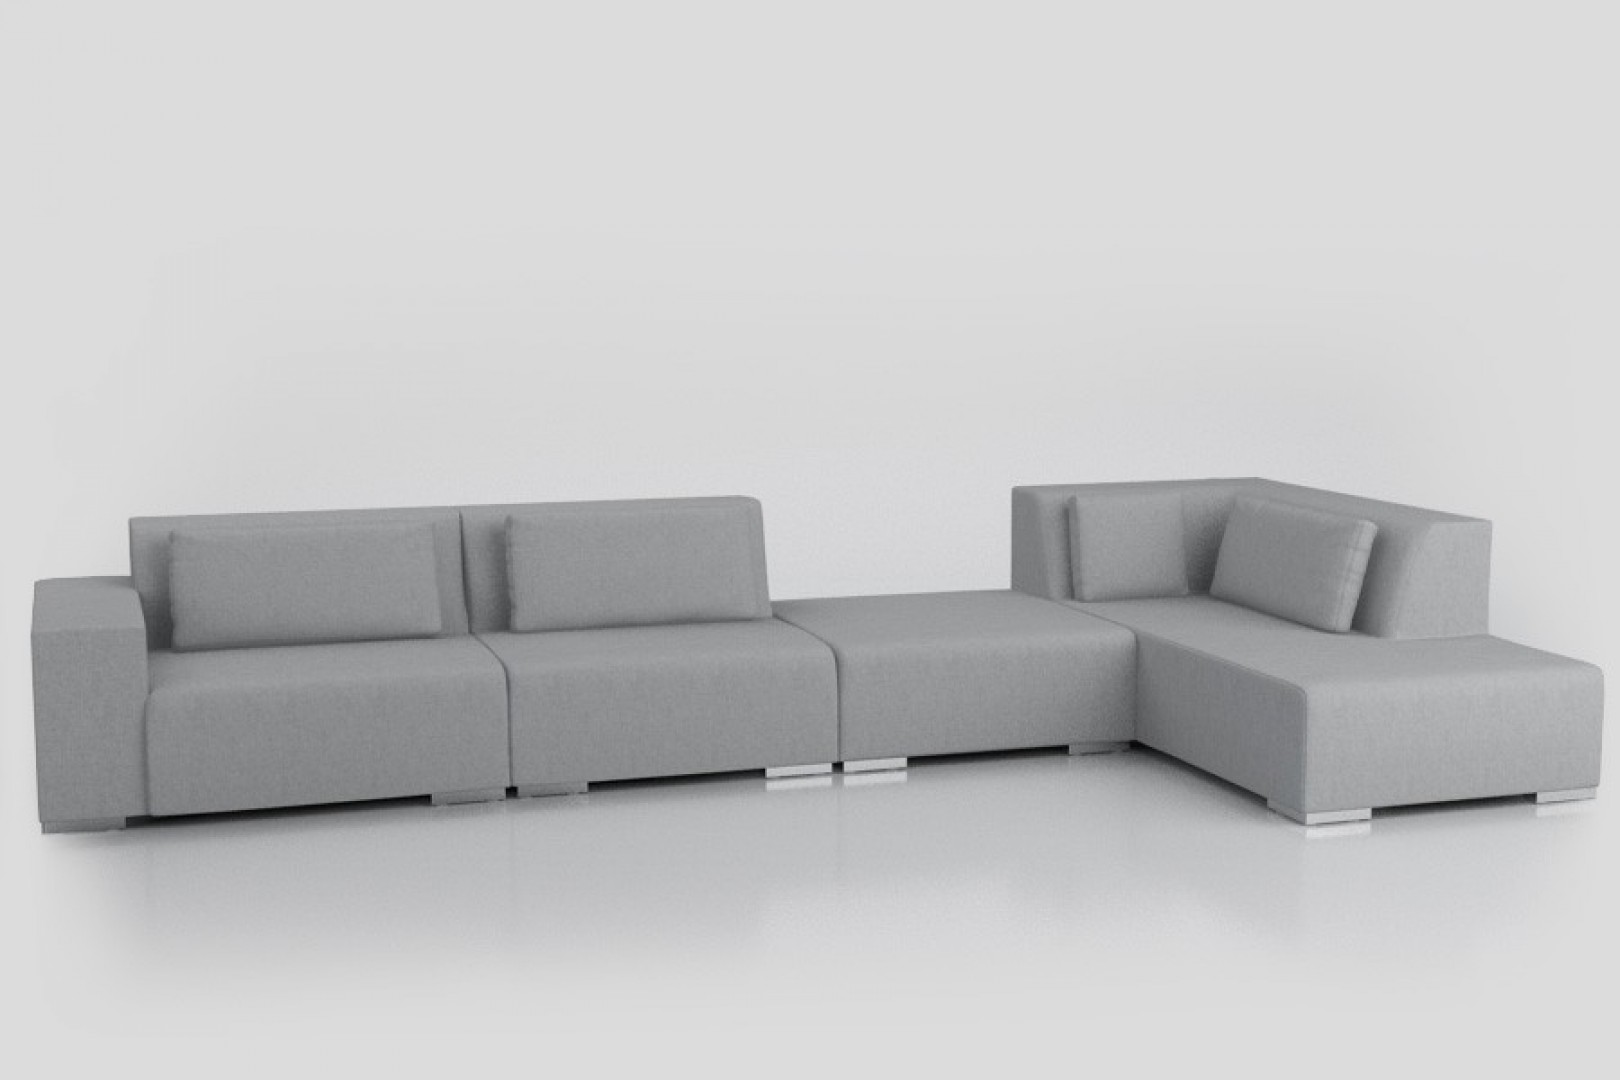 Sofa Cube. Fot. Adriana Furniture